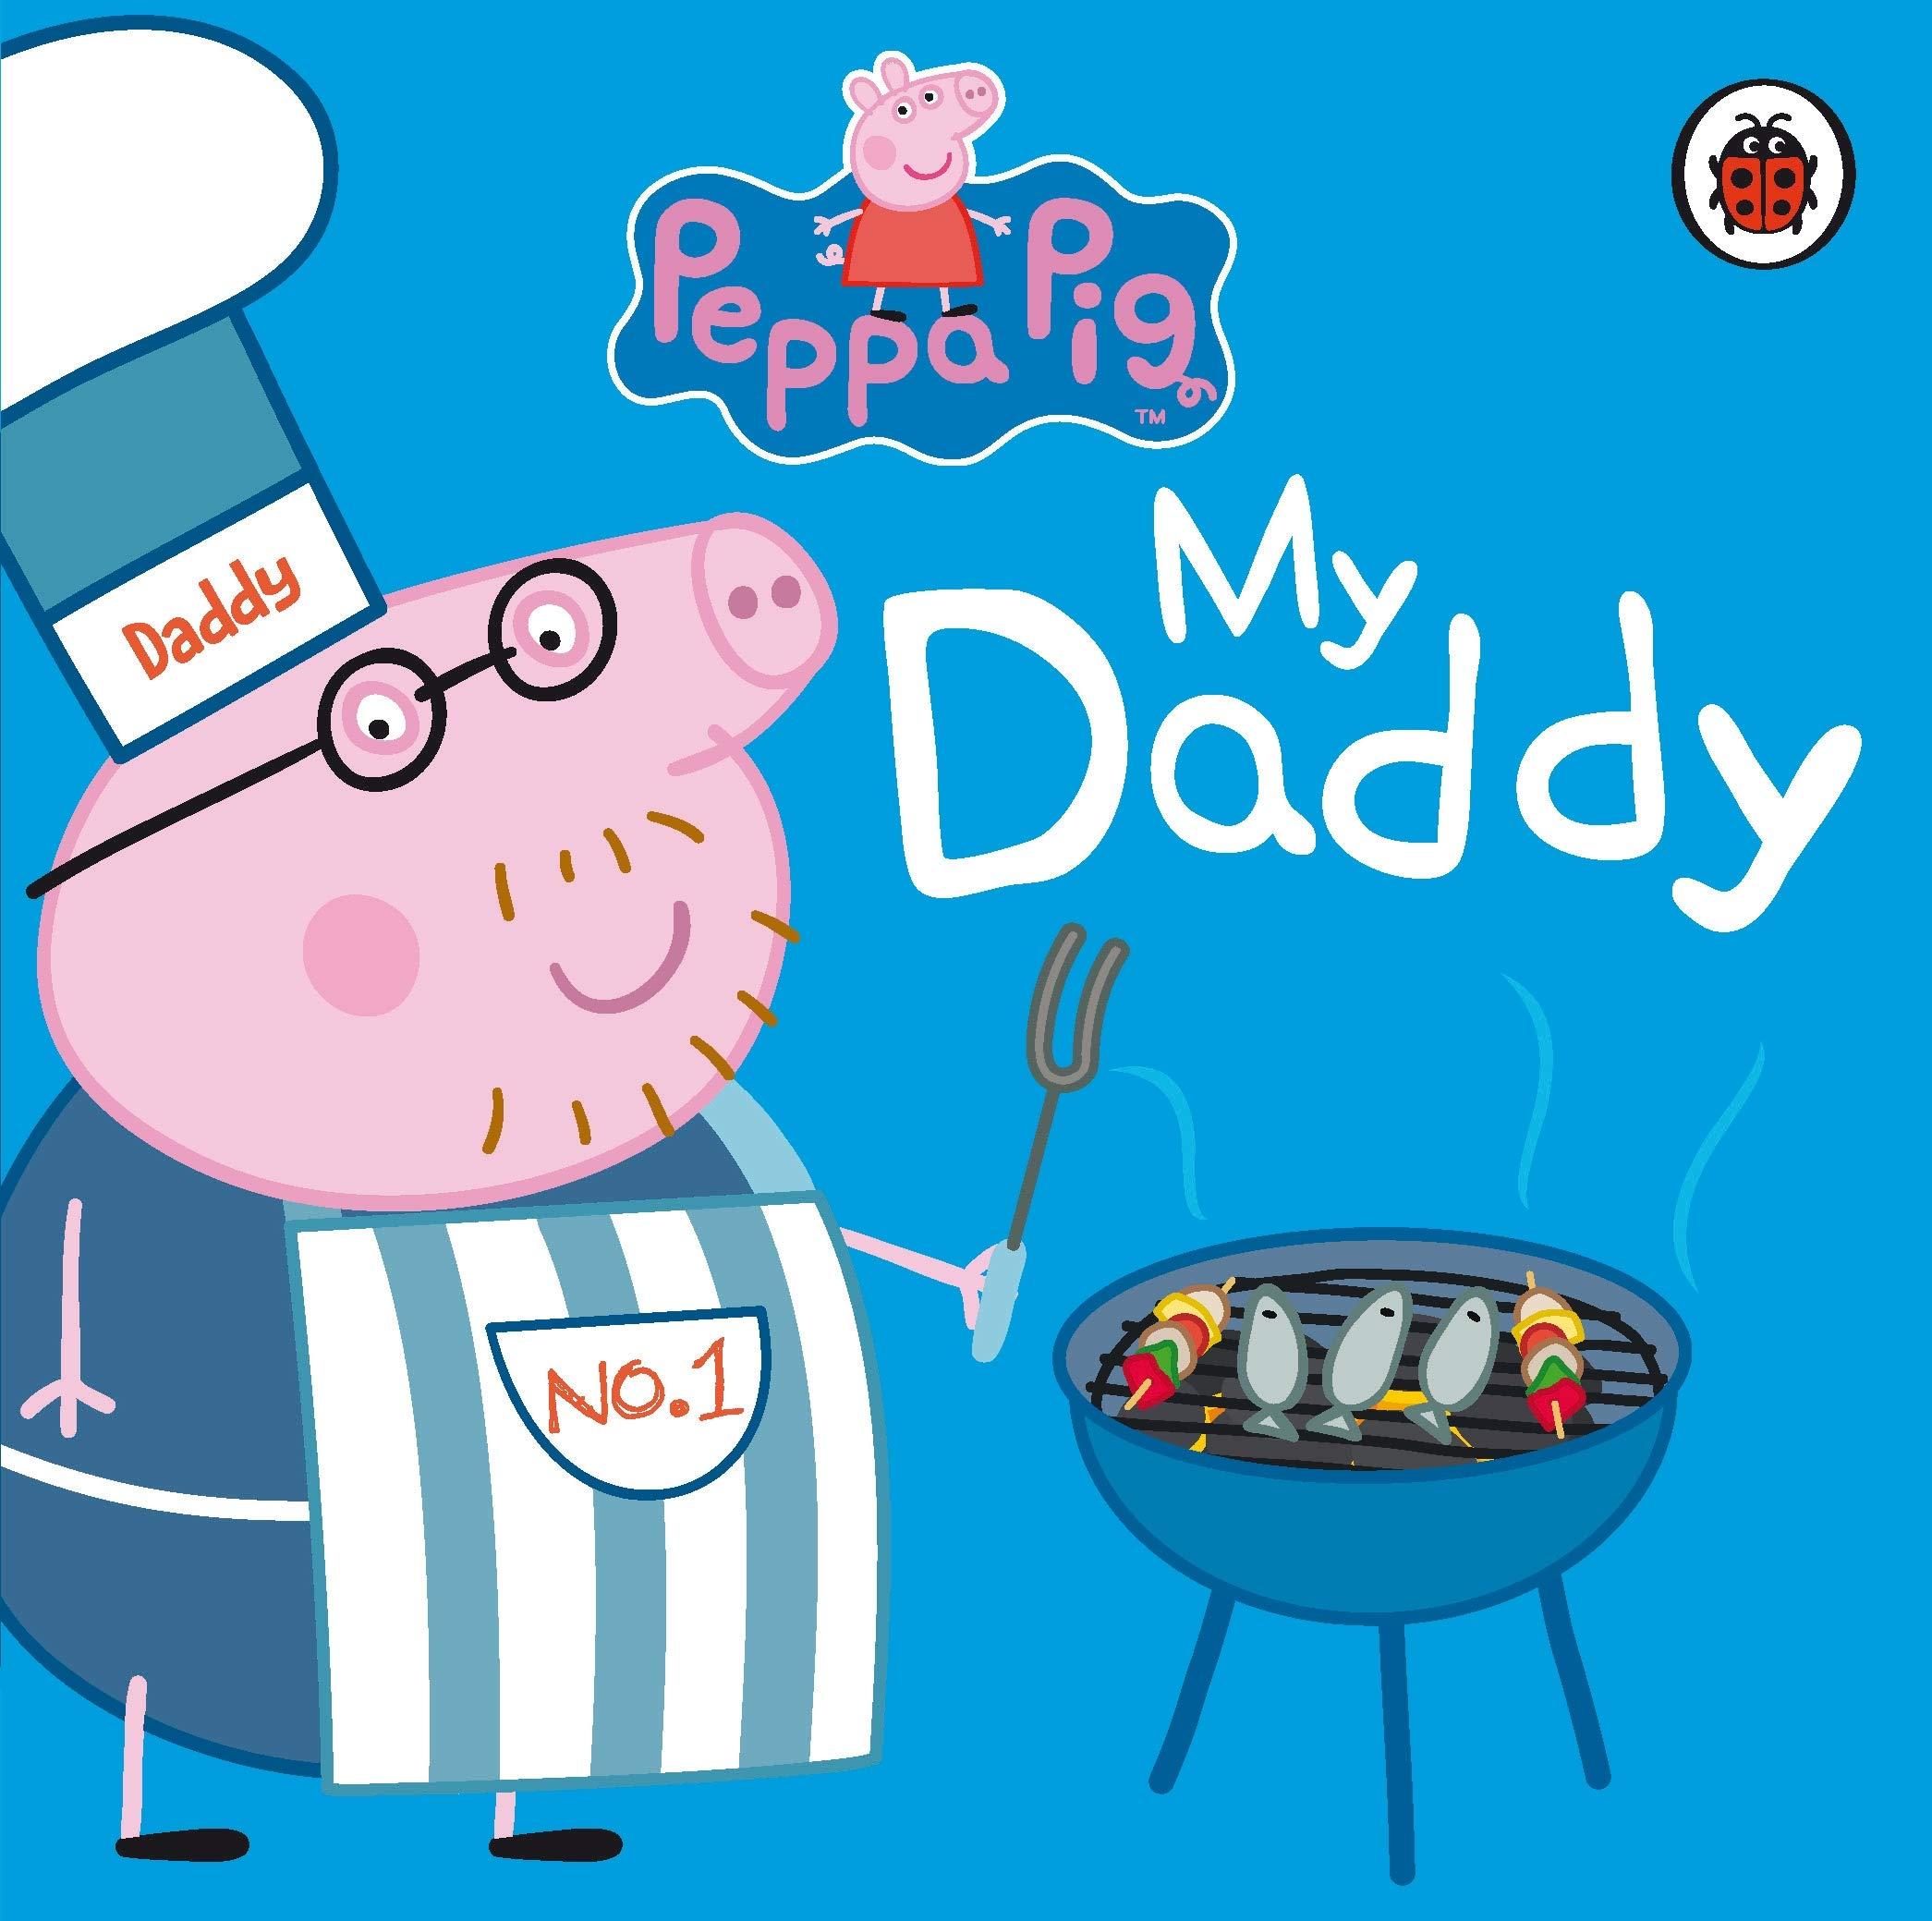 Peppa Pig My Daddy Amazon Co Uk Peppa Pig Books